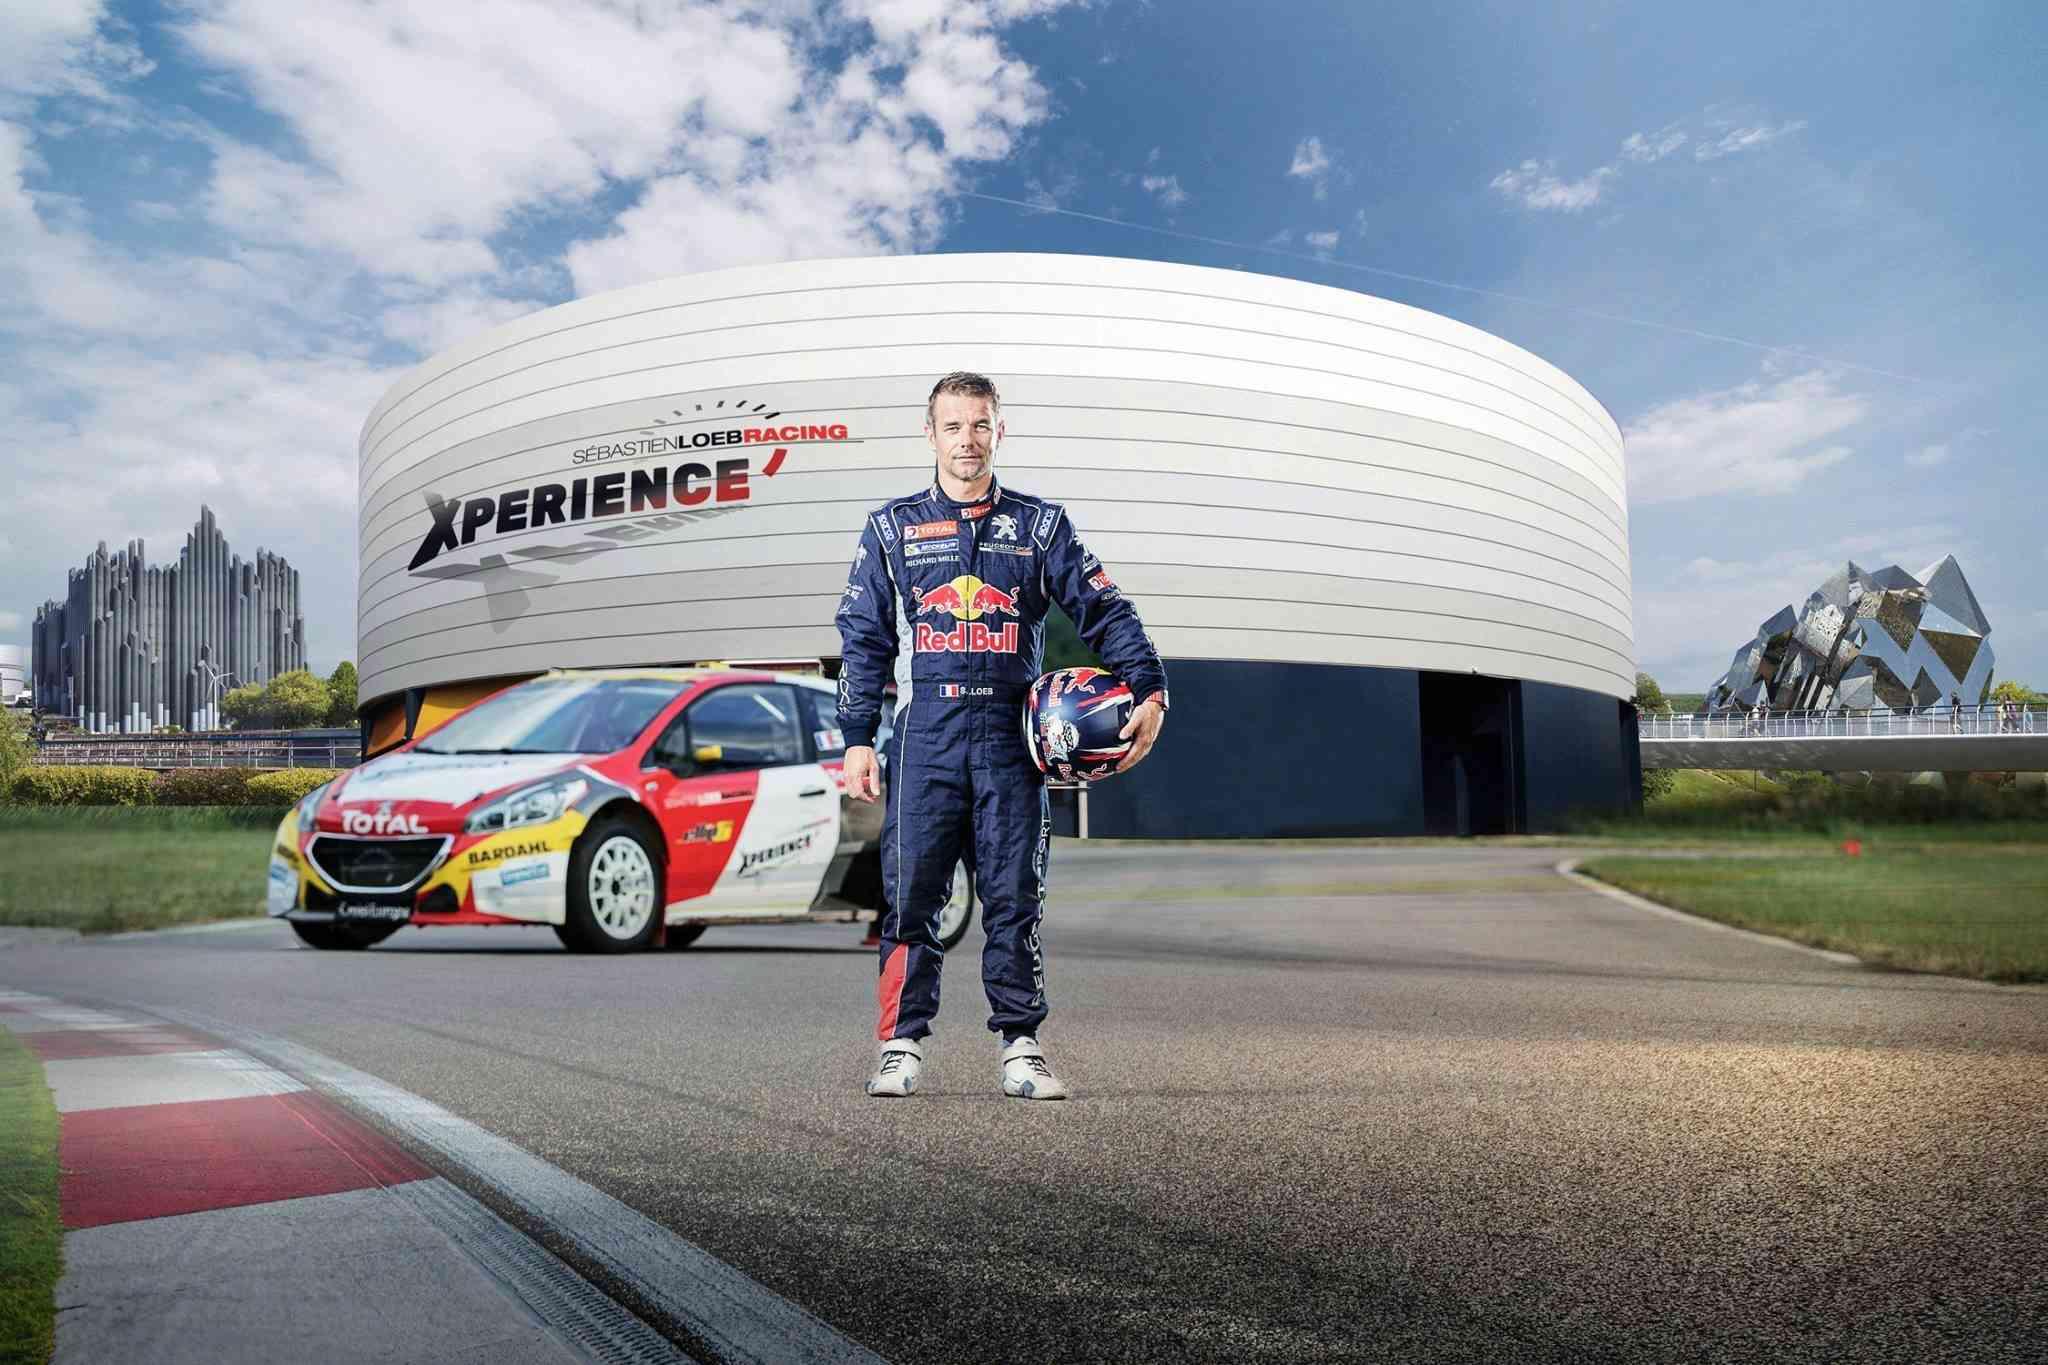 Sébastien Loeb Racing Xperience (pavillon 360°) · avril 2018 - Page 9 Visuel10